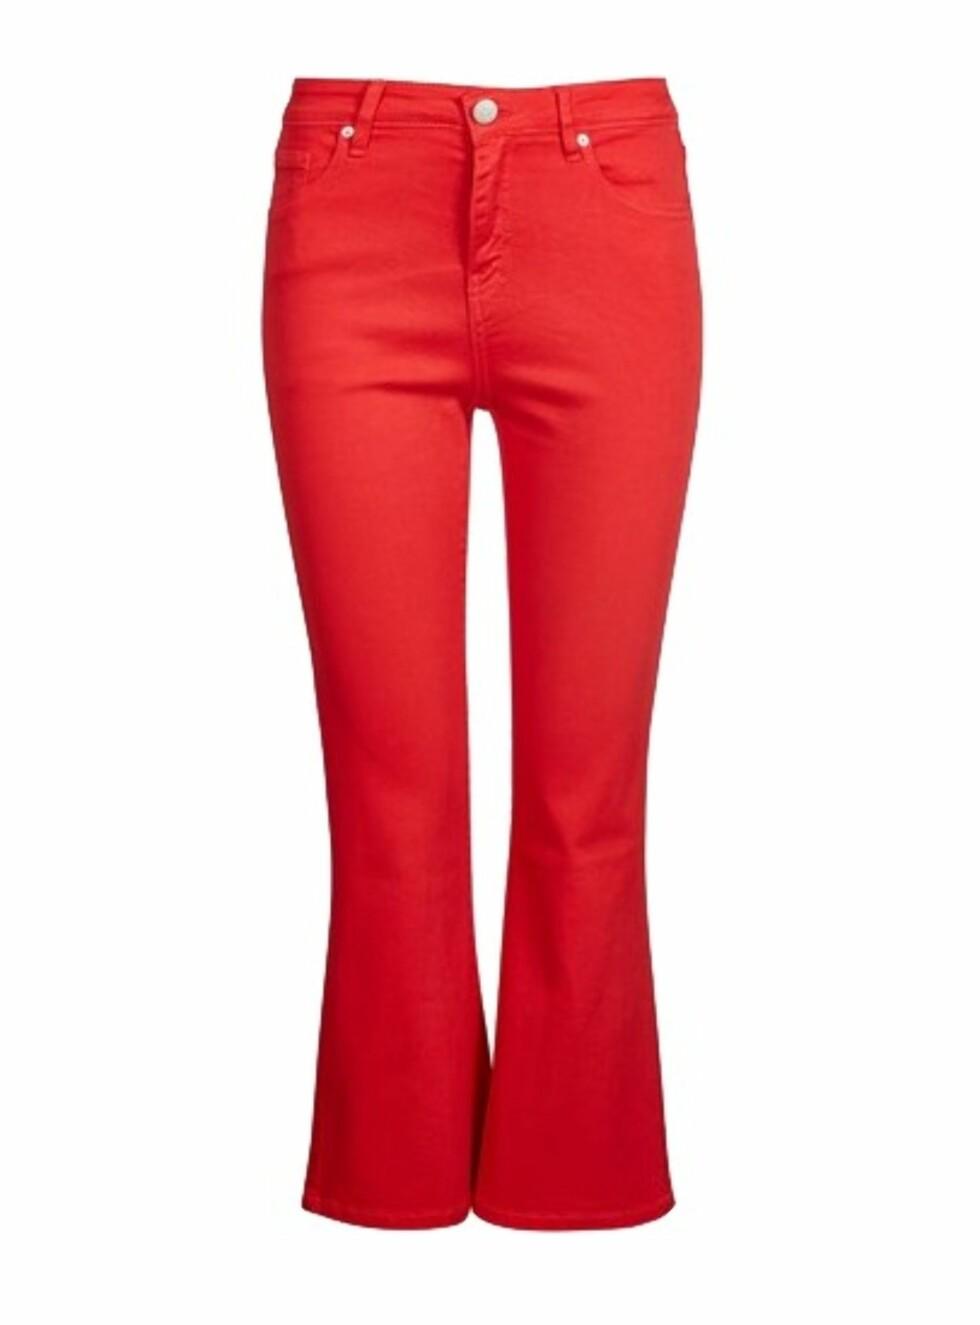 Bukse fra Cubus |299,-|https://cubus.com/no/p/bukser/jeans/kick-flare-twill-jeans/7216402_F370